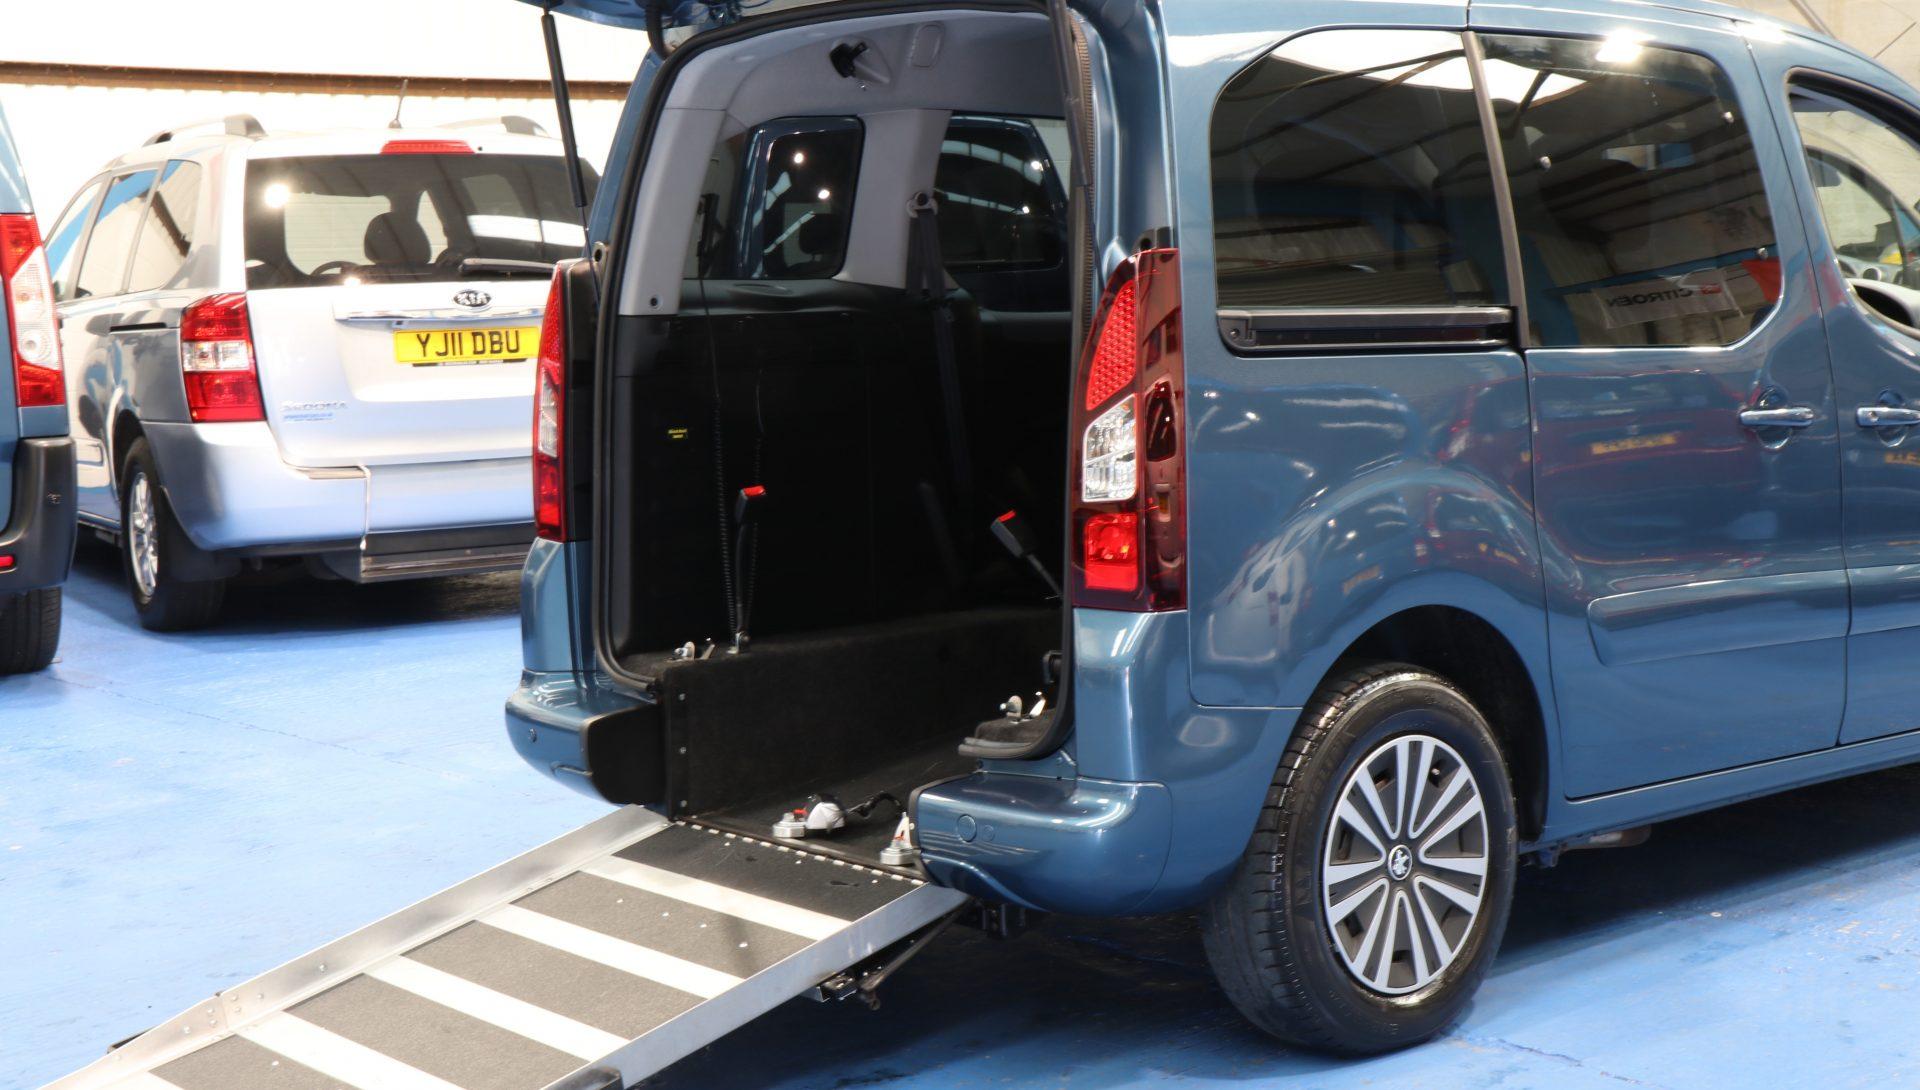 Partner Wheelchair vehicle Sf13 ftp